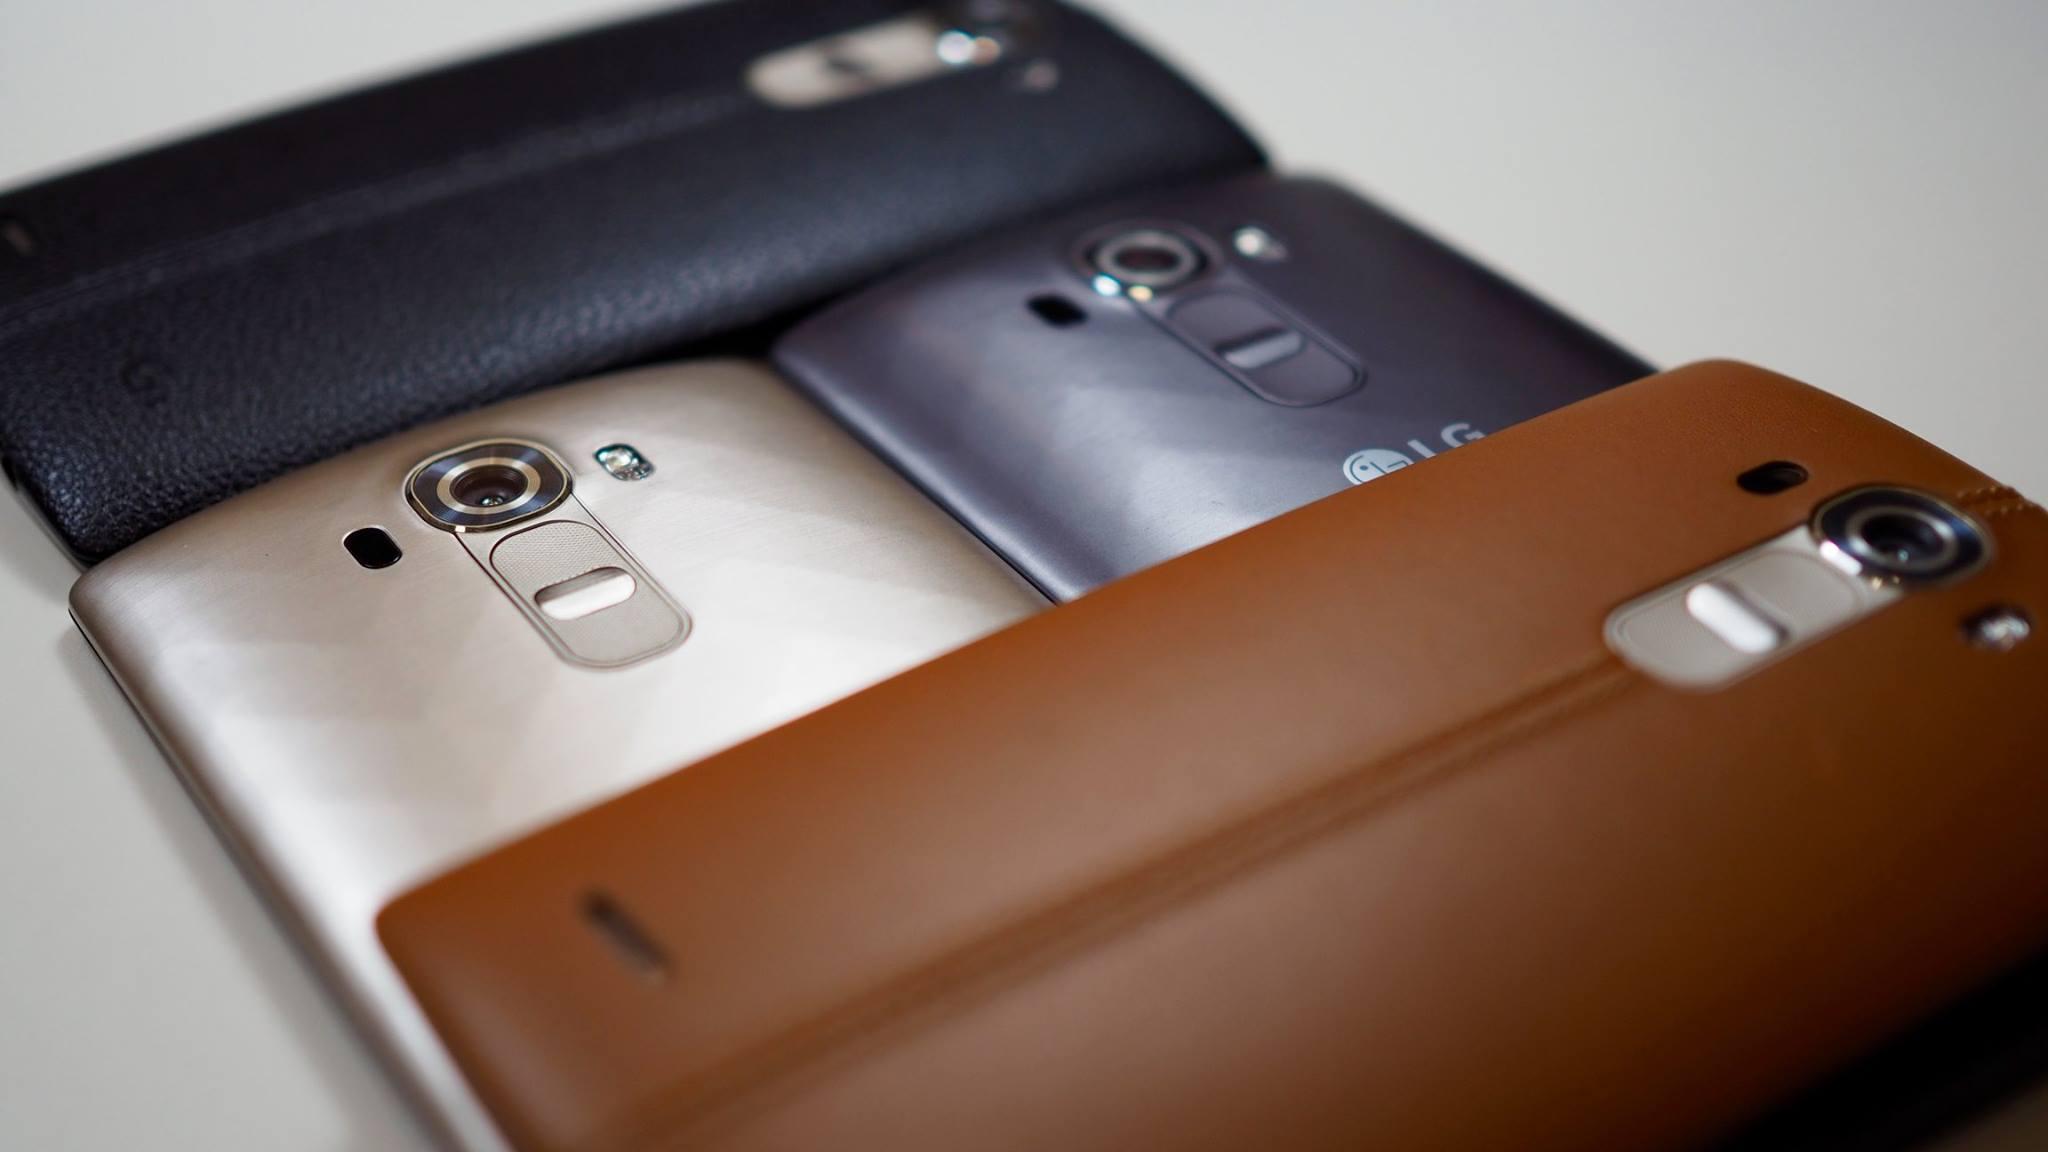 LG-G4-Leder-und-Kunststoff-Rückseite.jpg